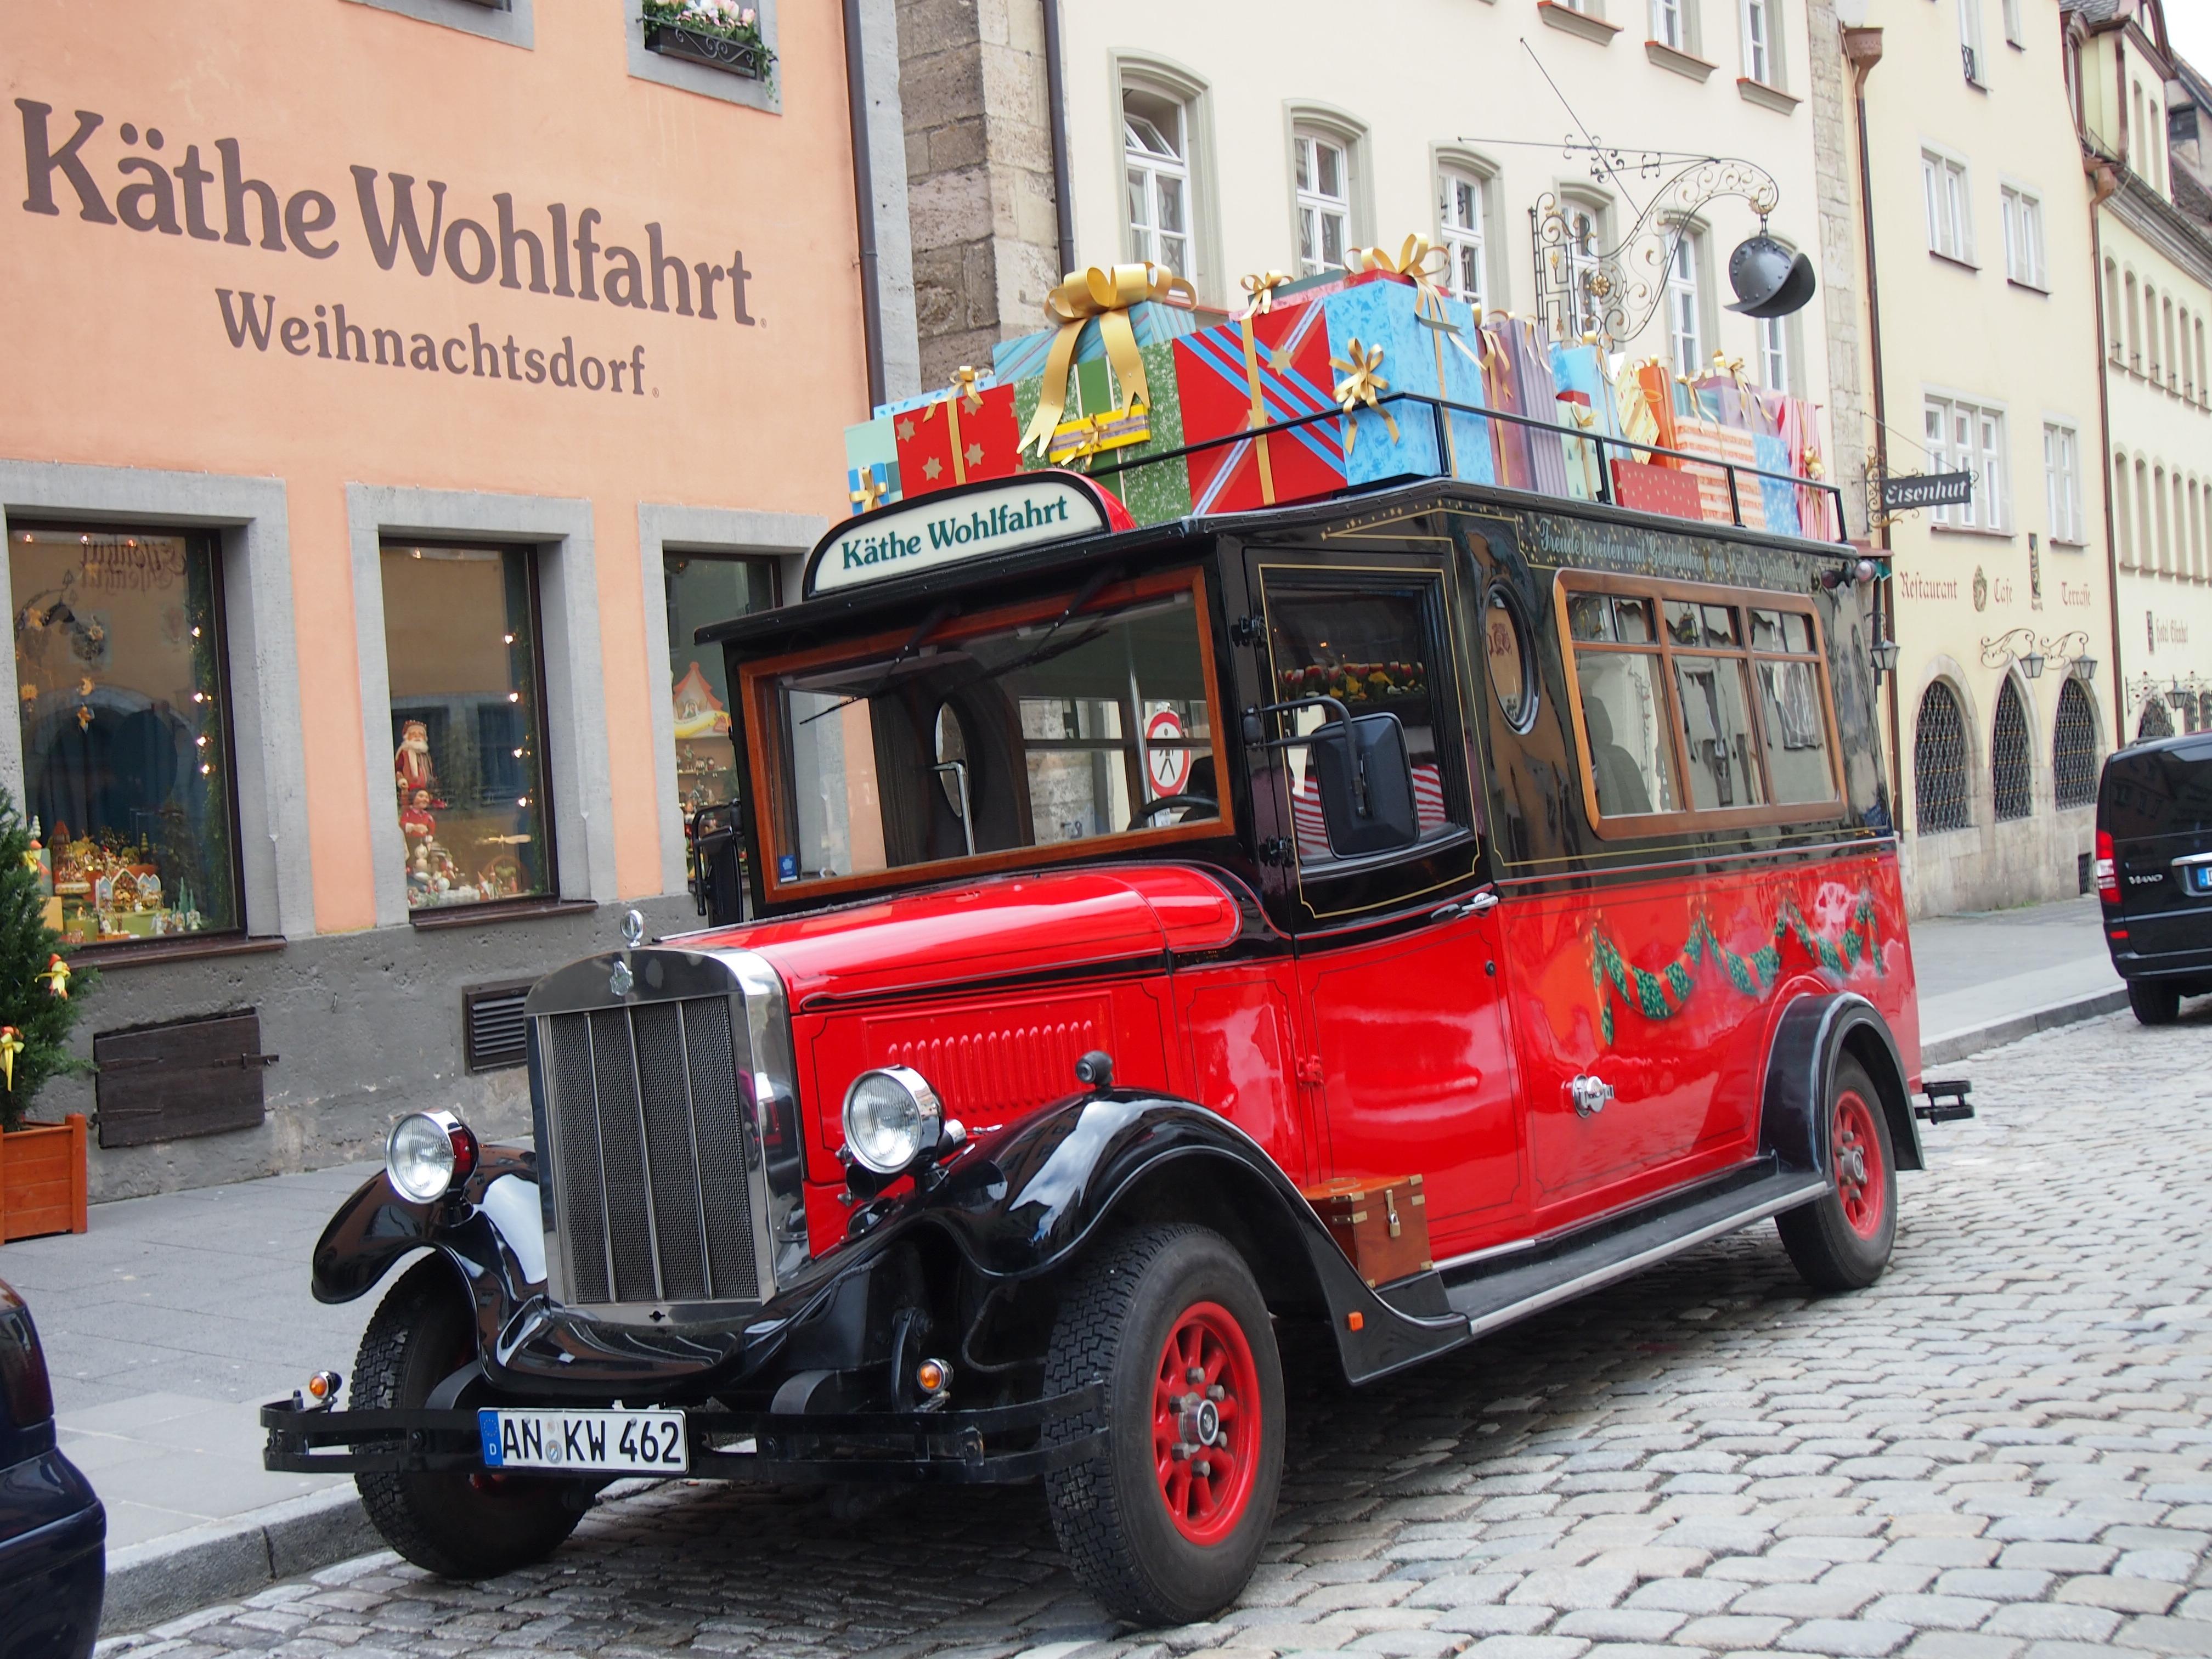 Rothenburg vintage bus photo